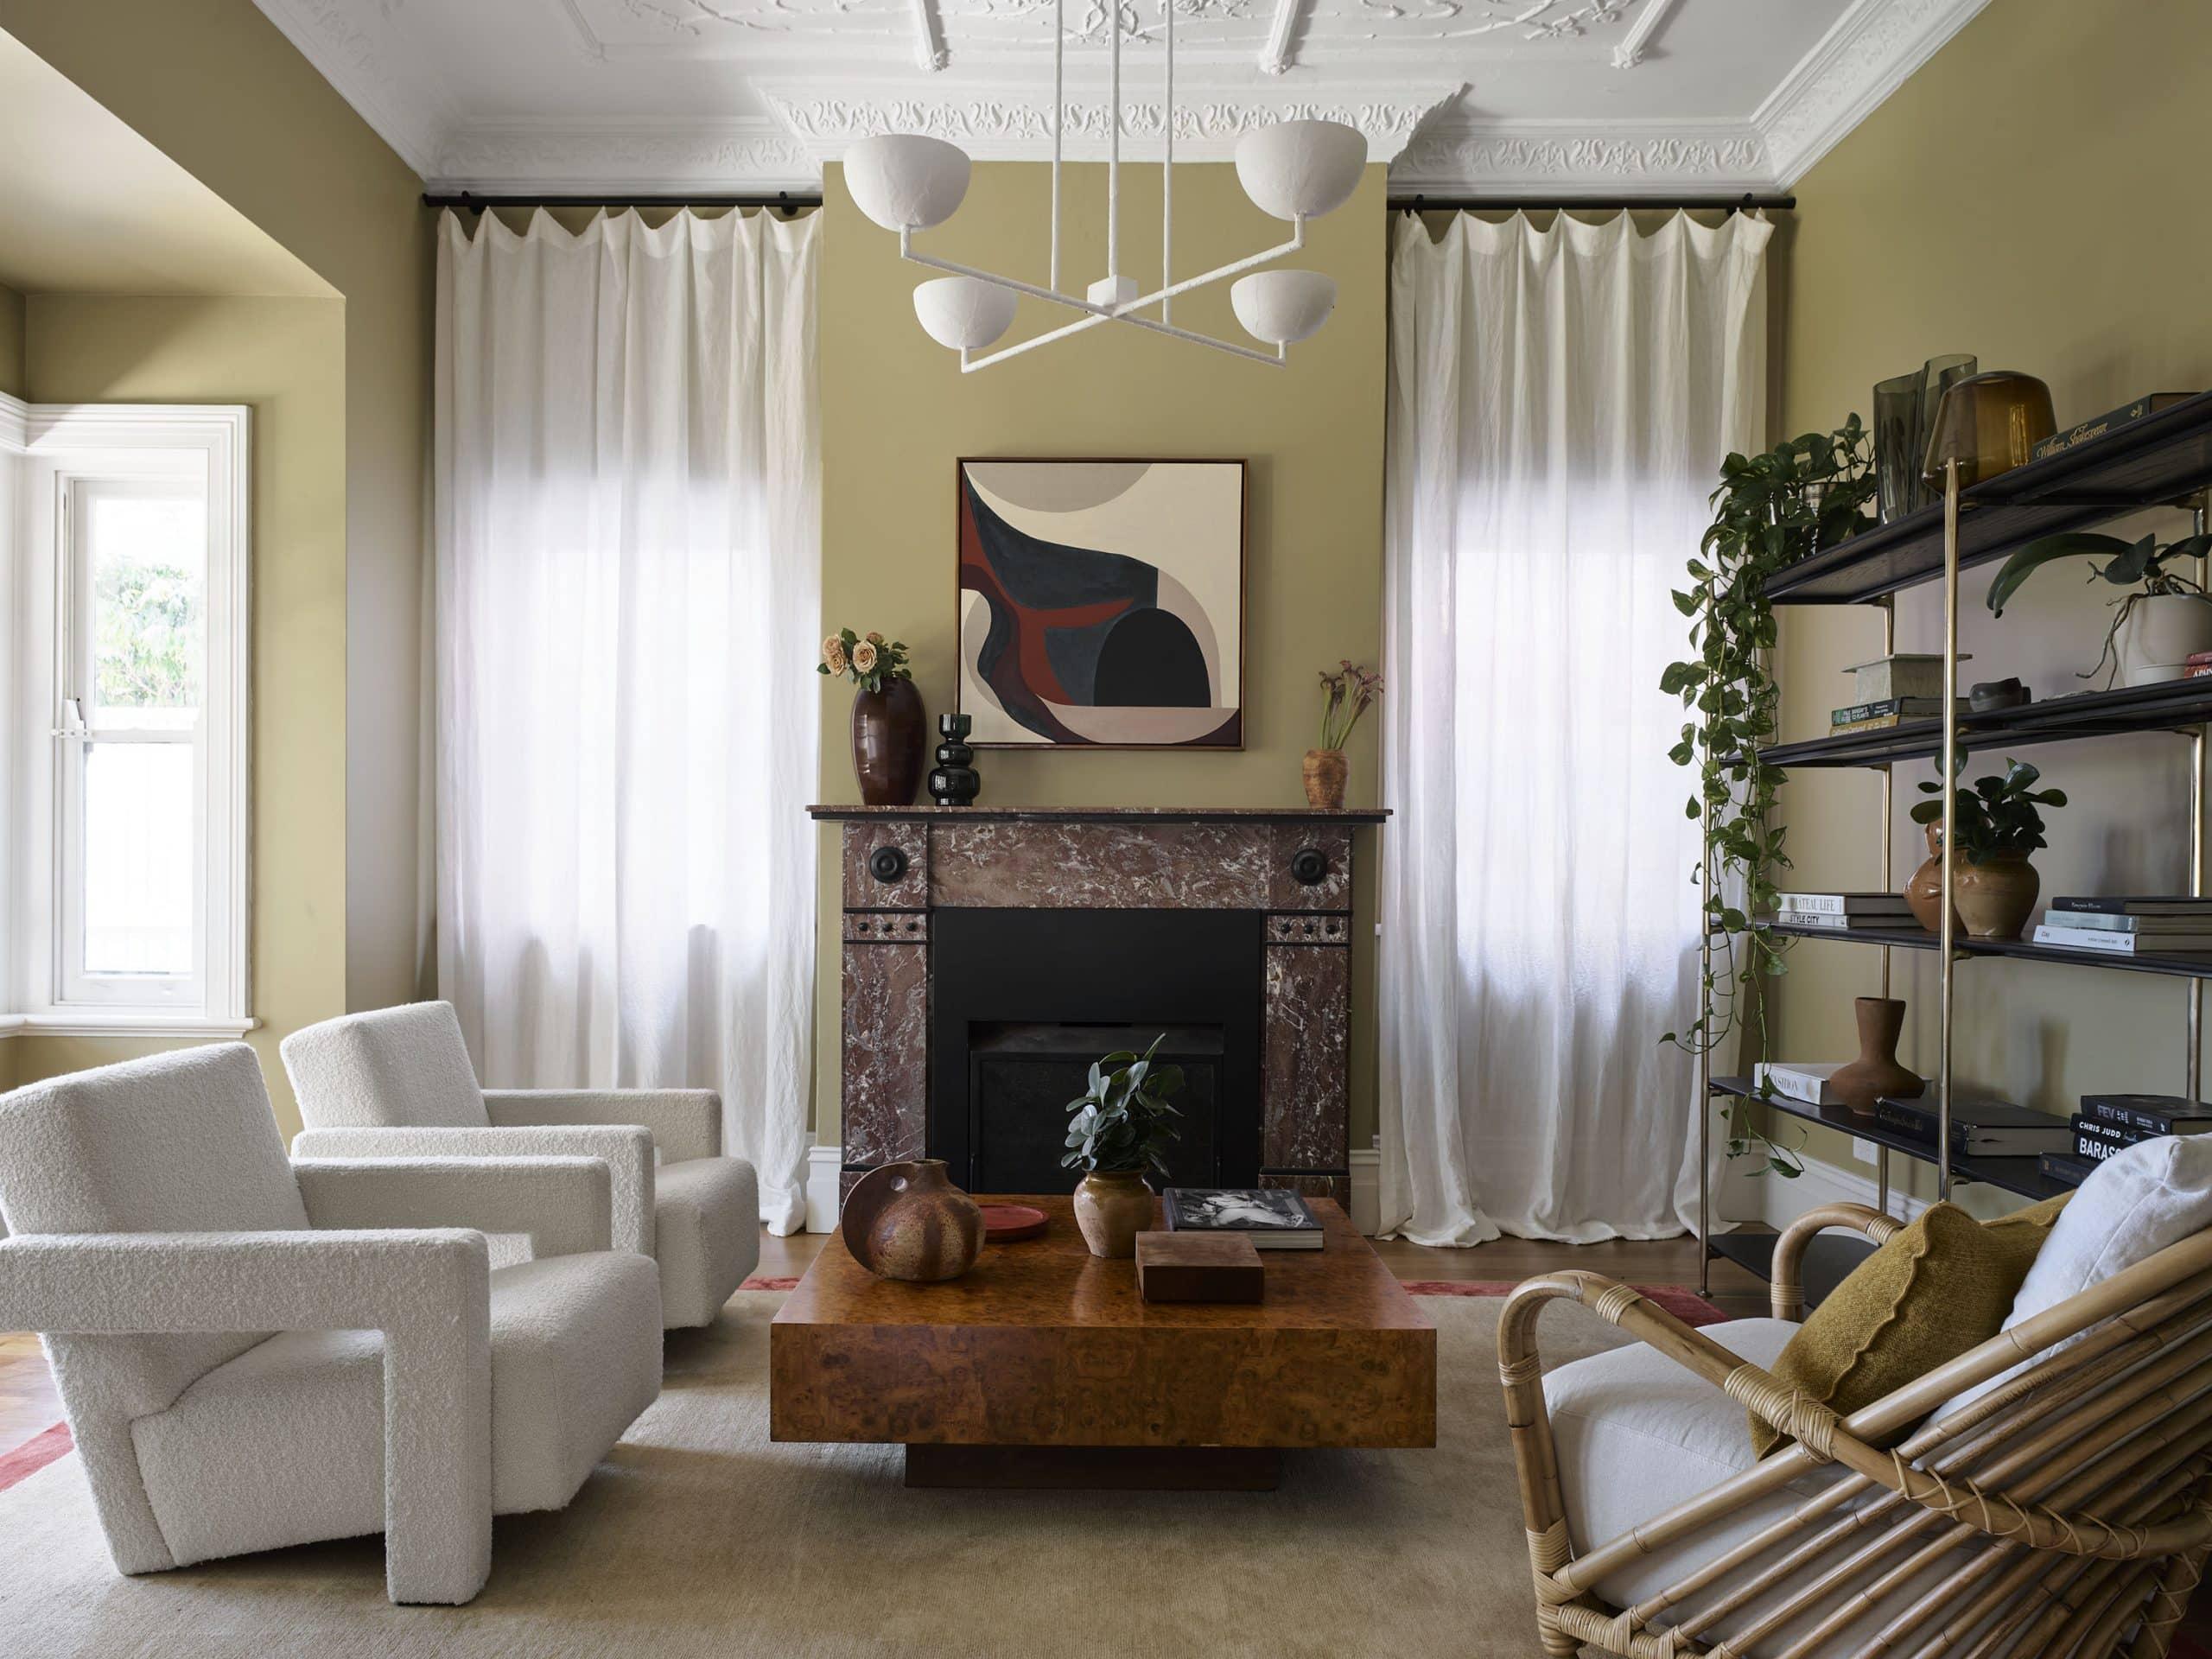 Sarah-Jane Pyke Juliette Arent Arent&Pyke Australian interior designers parlour house Queens Park Sydney